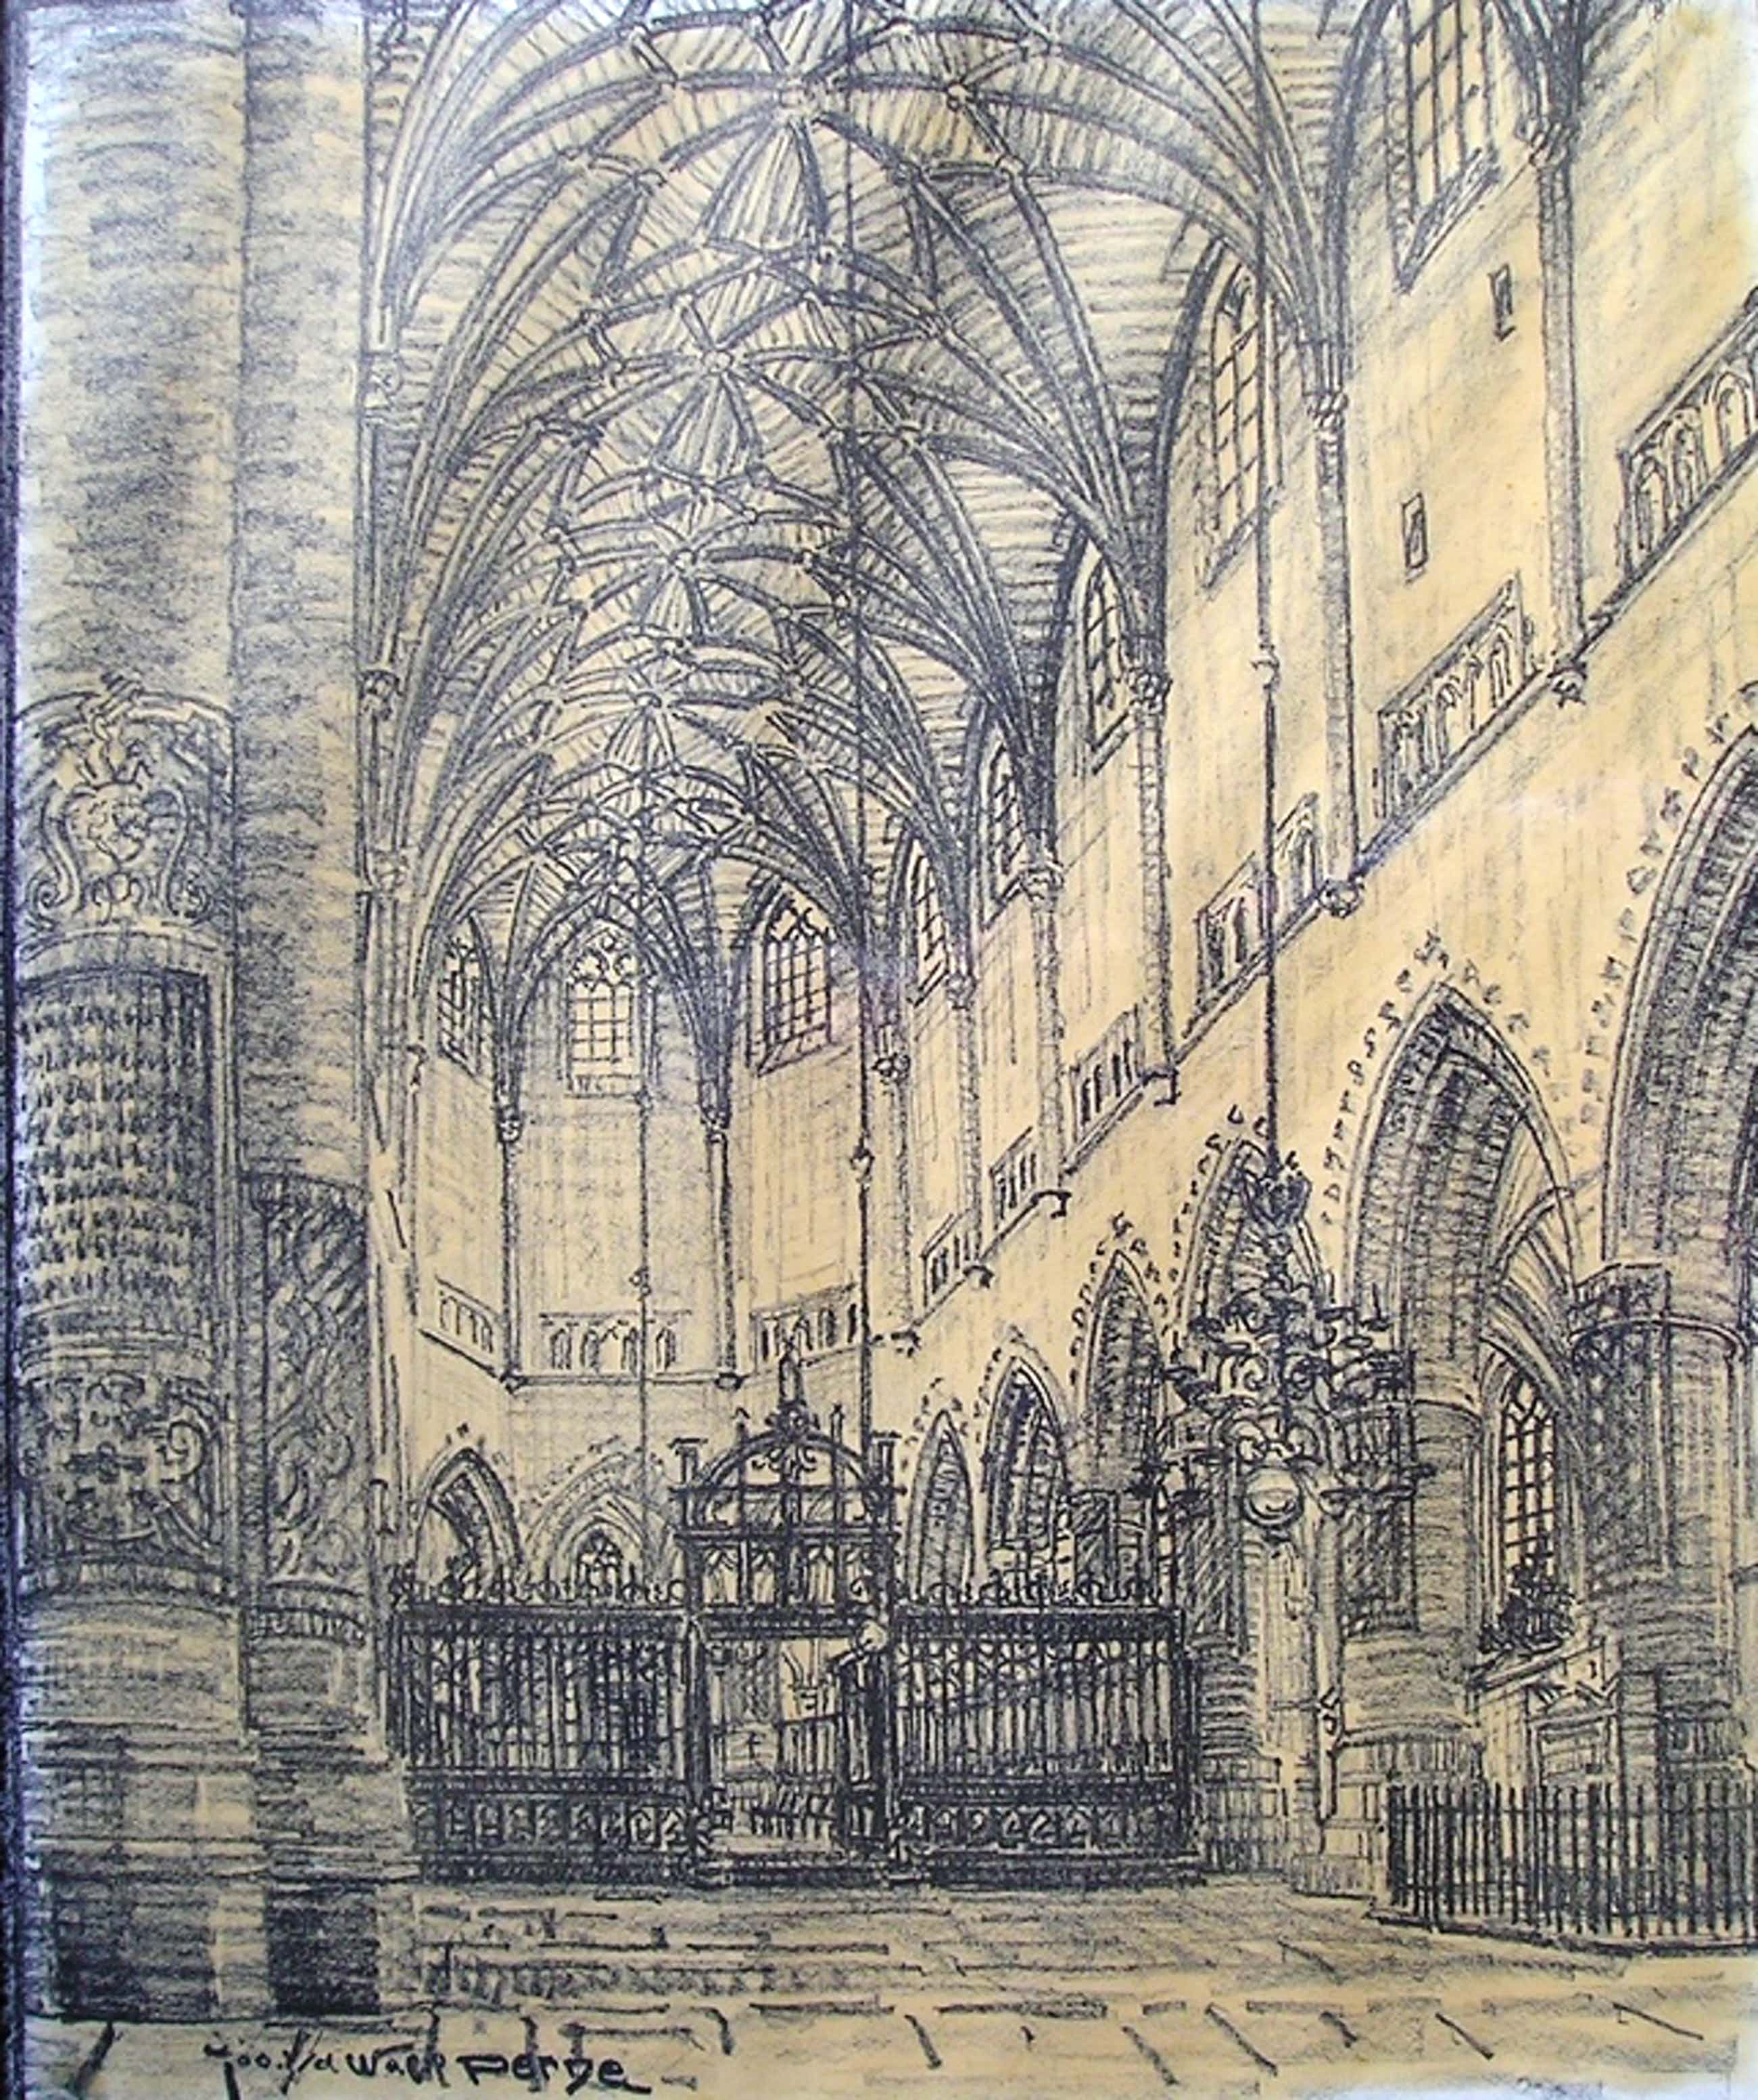 Jos van de Wall Perne (1877-1941) grafiek Interieur van St. Bavokerk Haarlem  kopen? Bied vanaf 35!